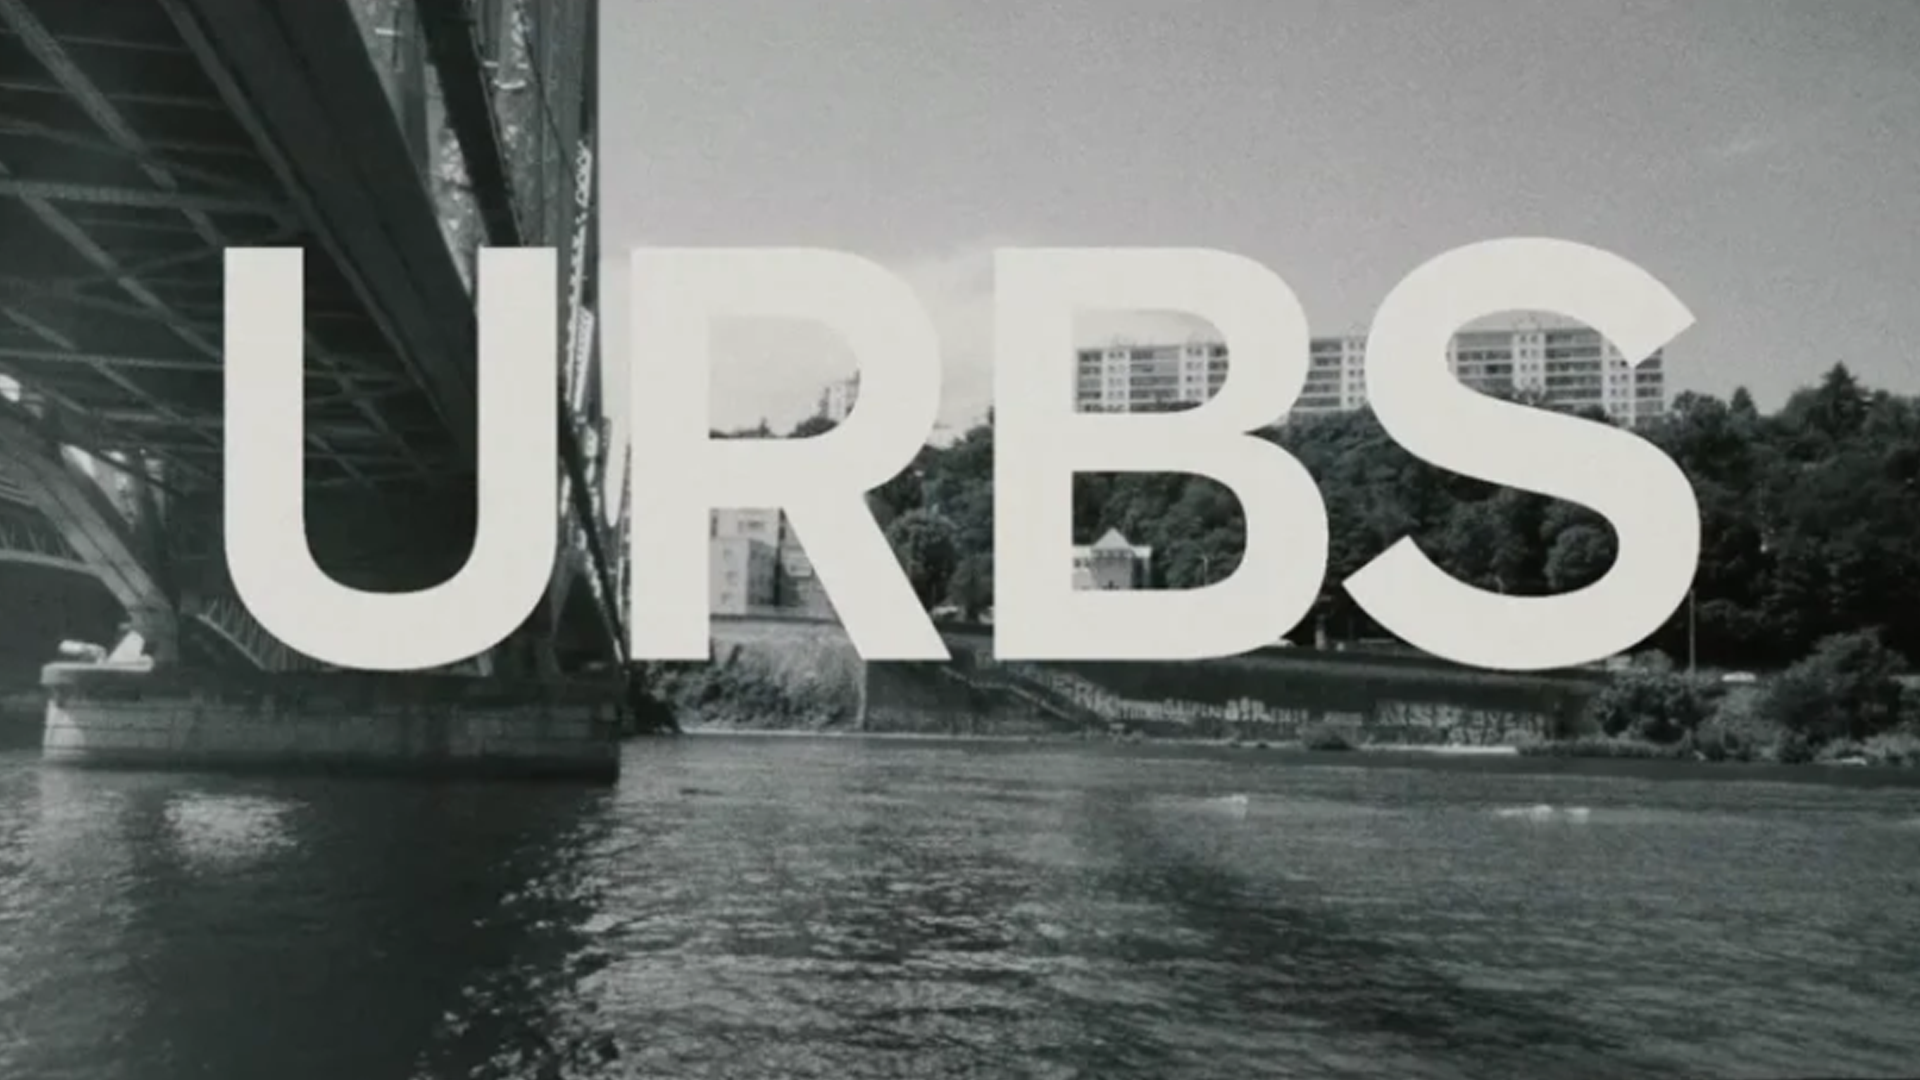 URBS - DOCUMENTAIRE 4x26'